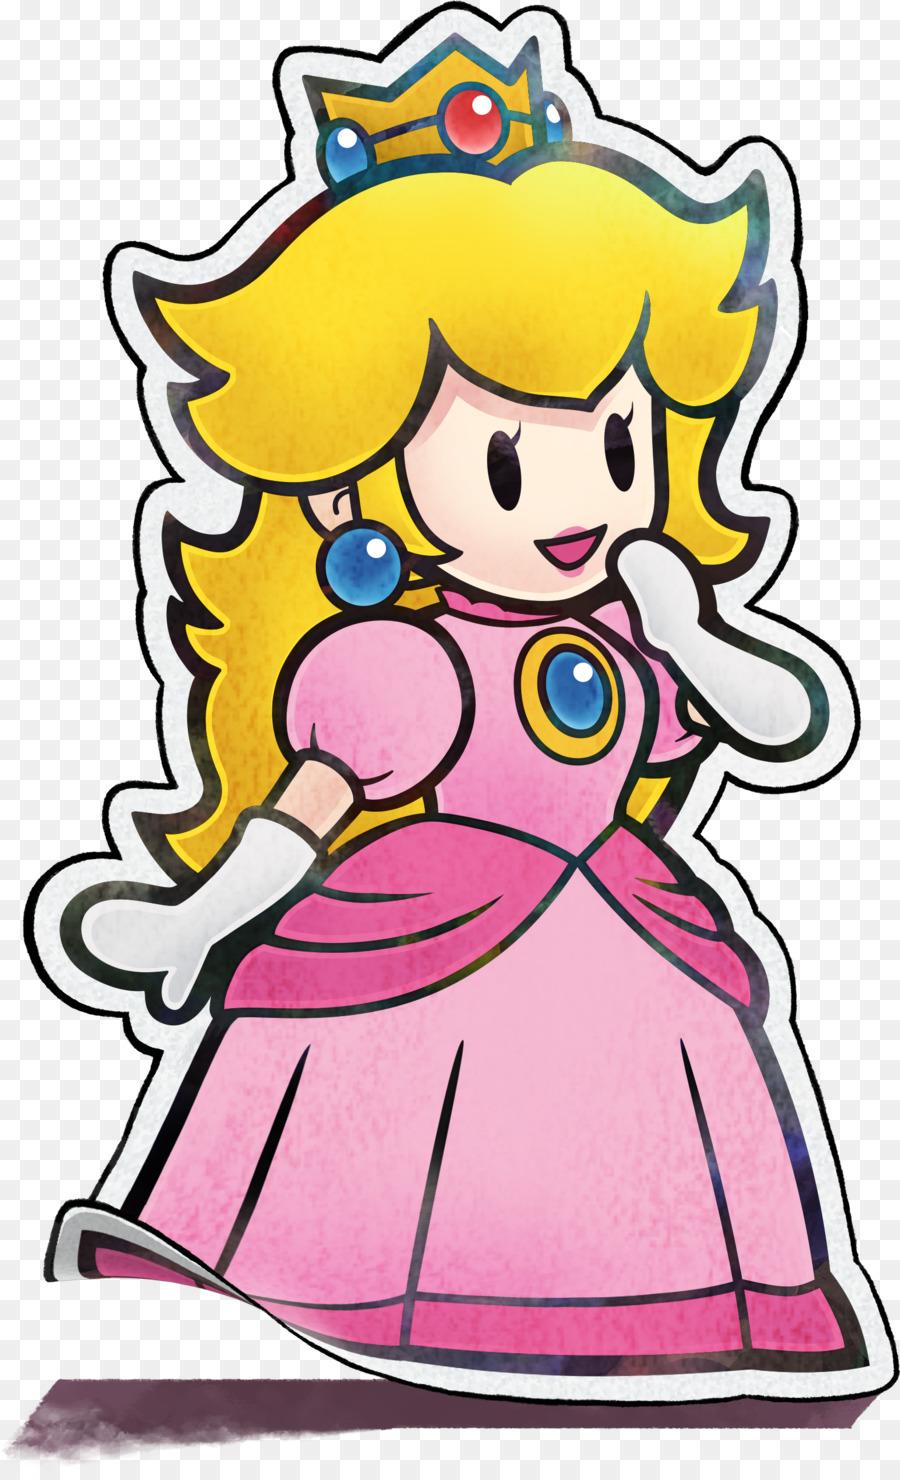 Mario and luigi kissing peach